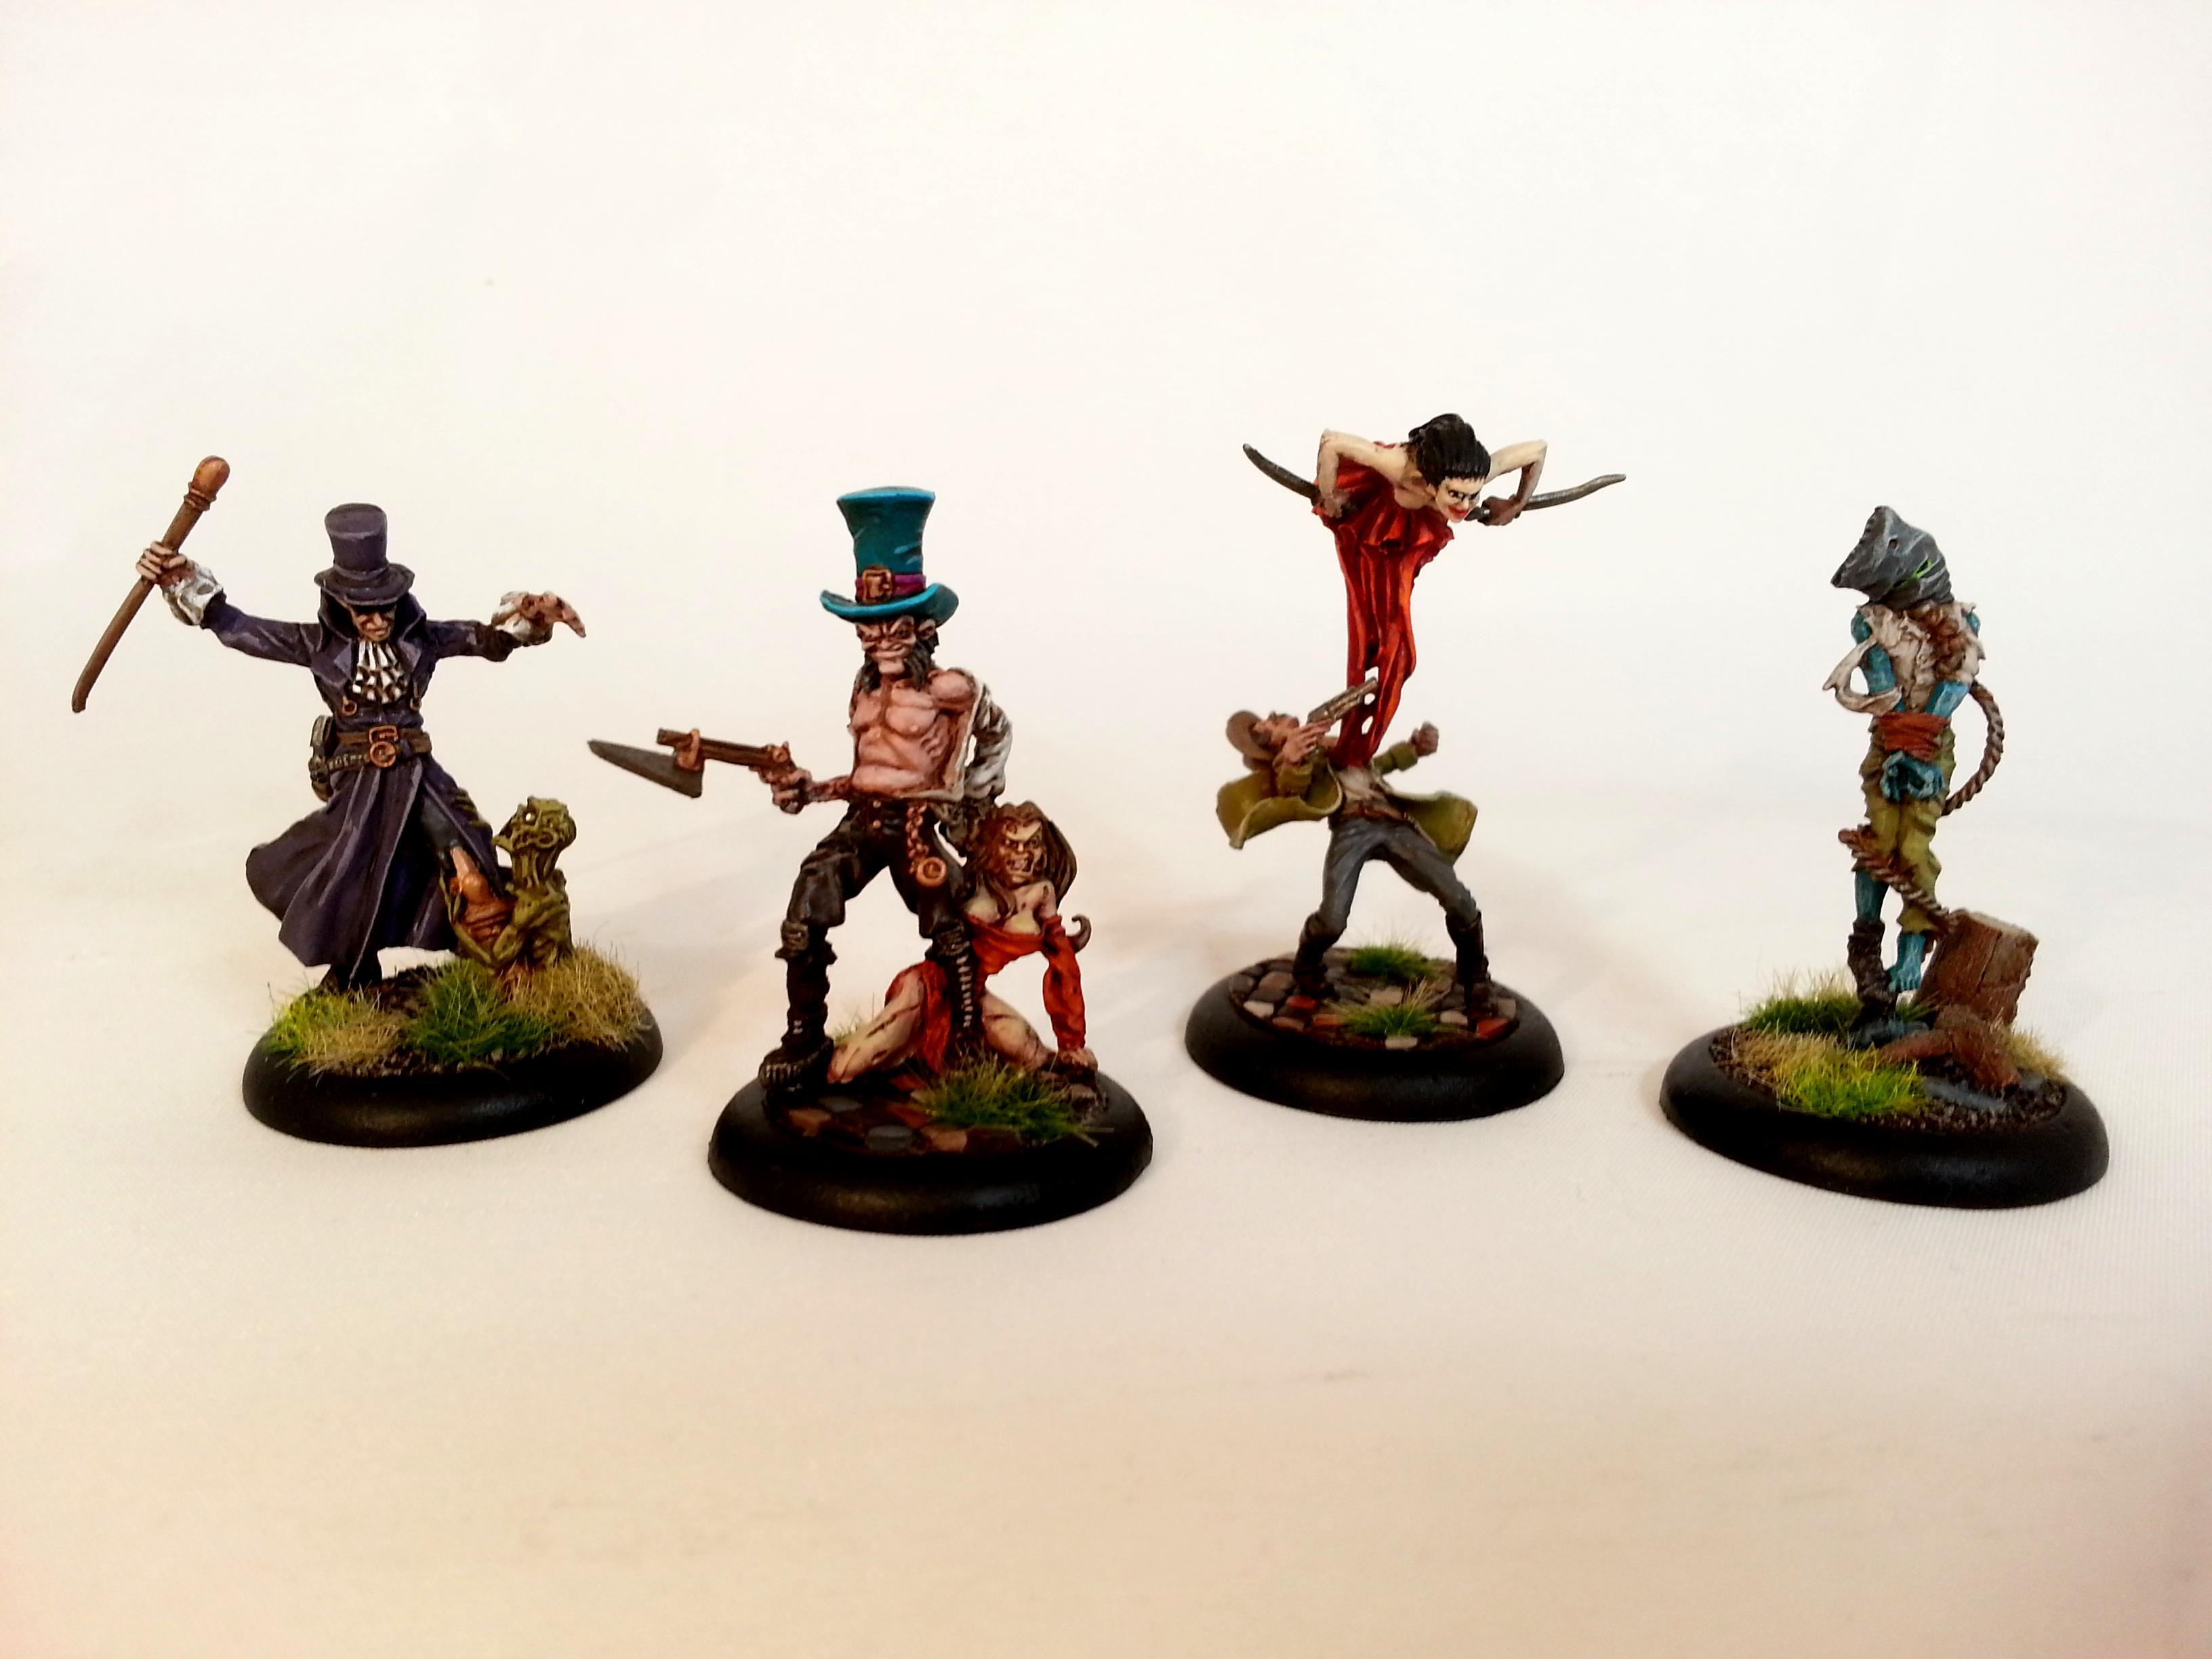 Avatar, Dead, Faction, Horde, Malifaux, Resurrectionists, Spirit, Undead